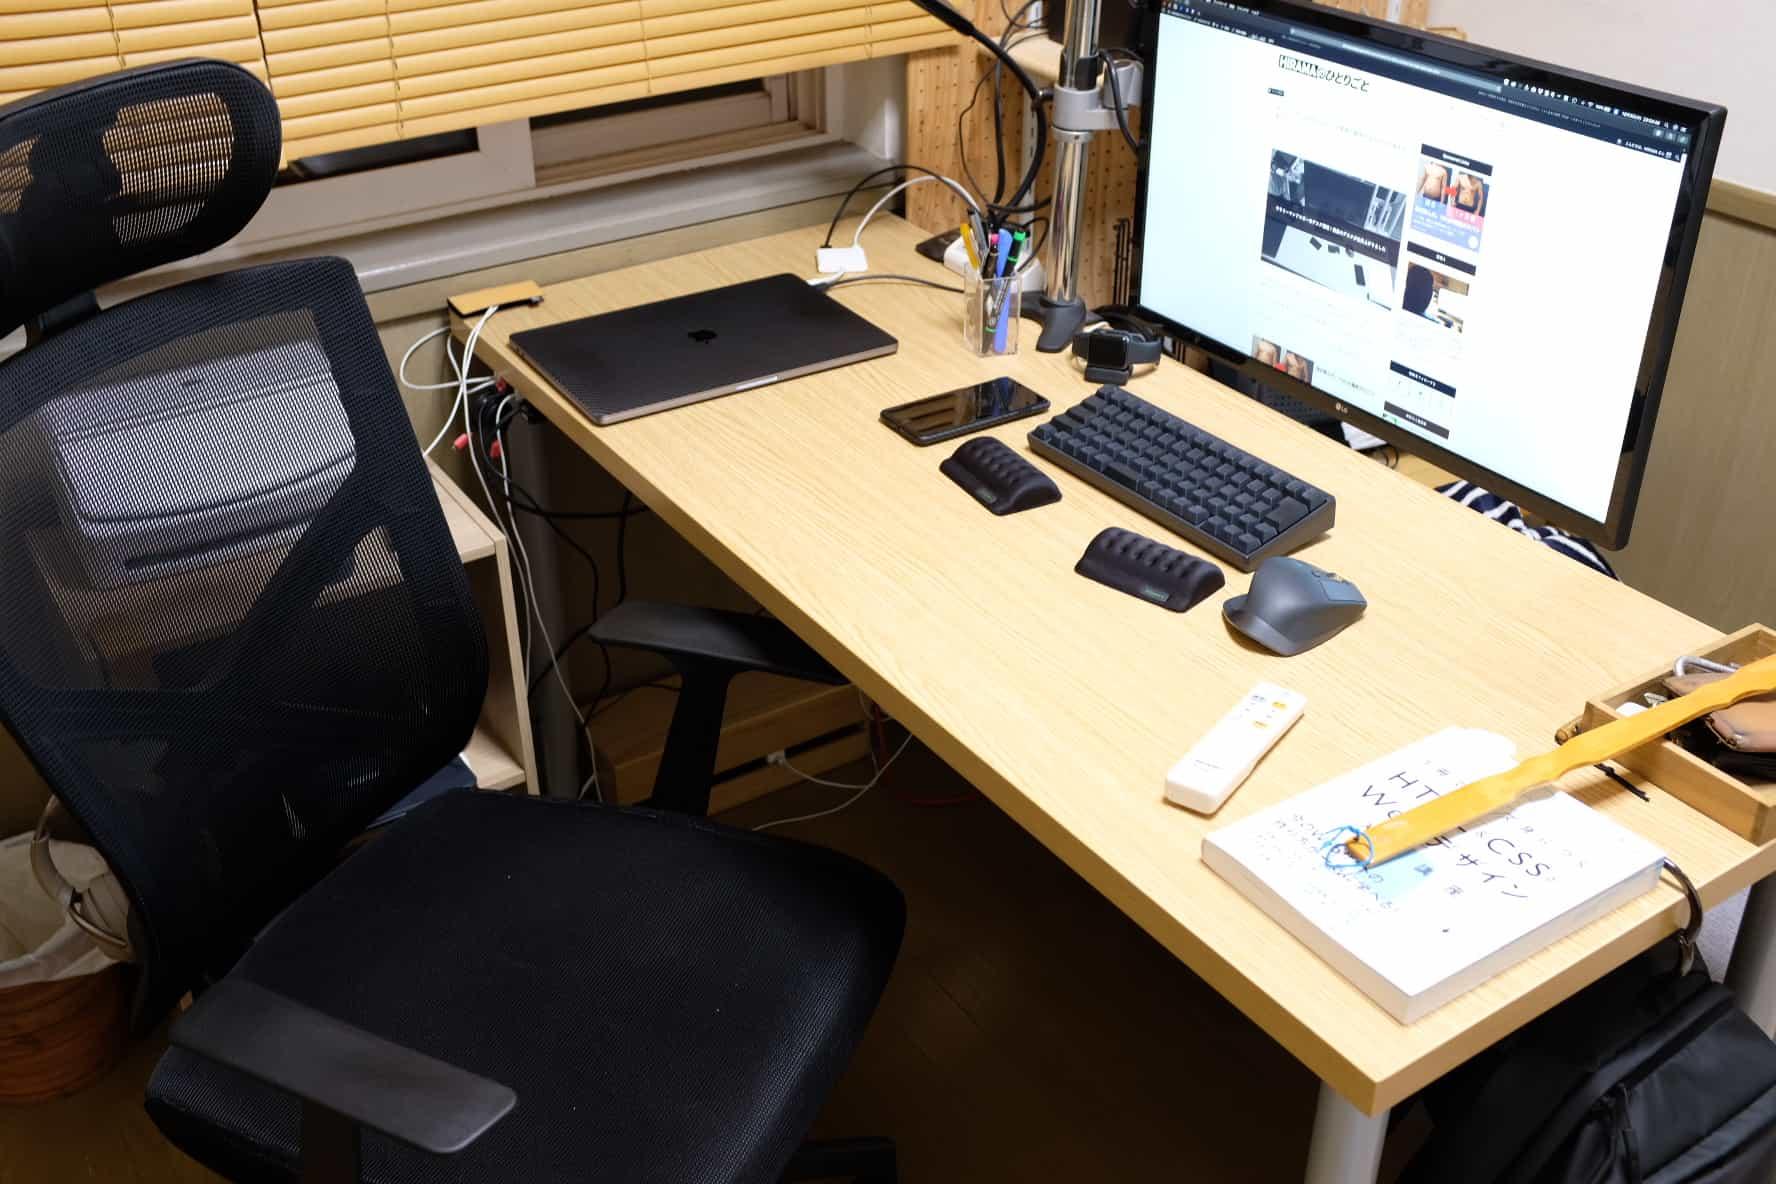 MacBookを外部ディスプレイと接続して使うときの配置